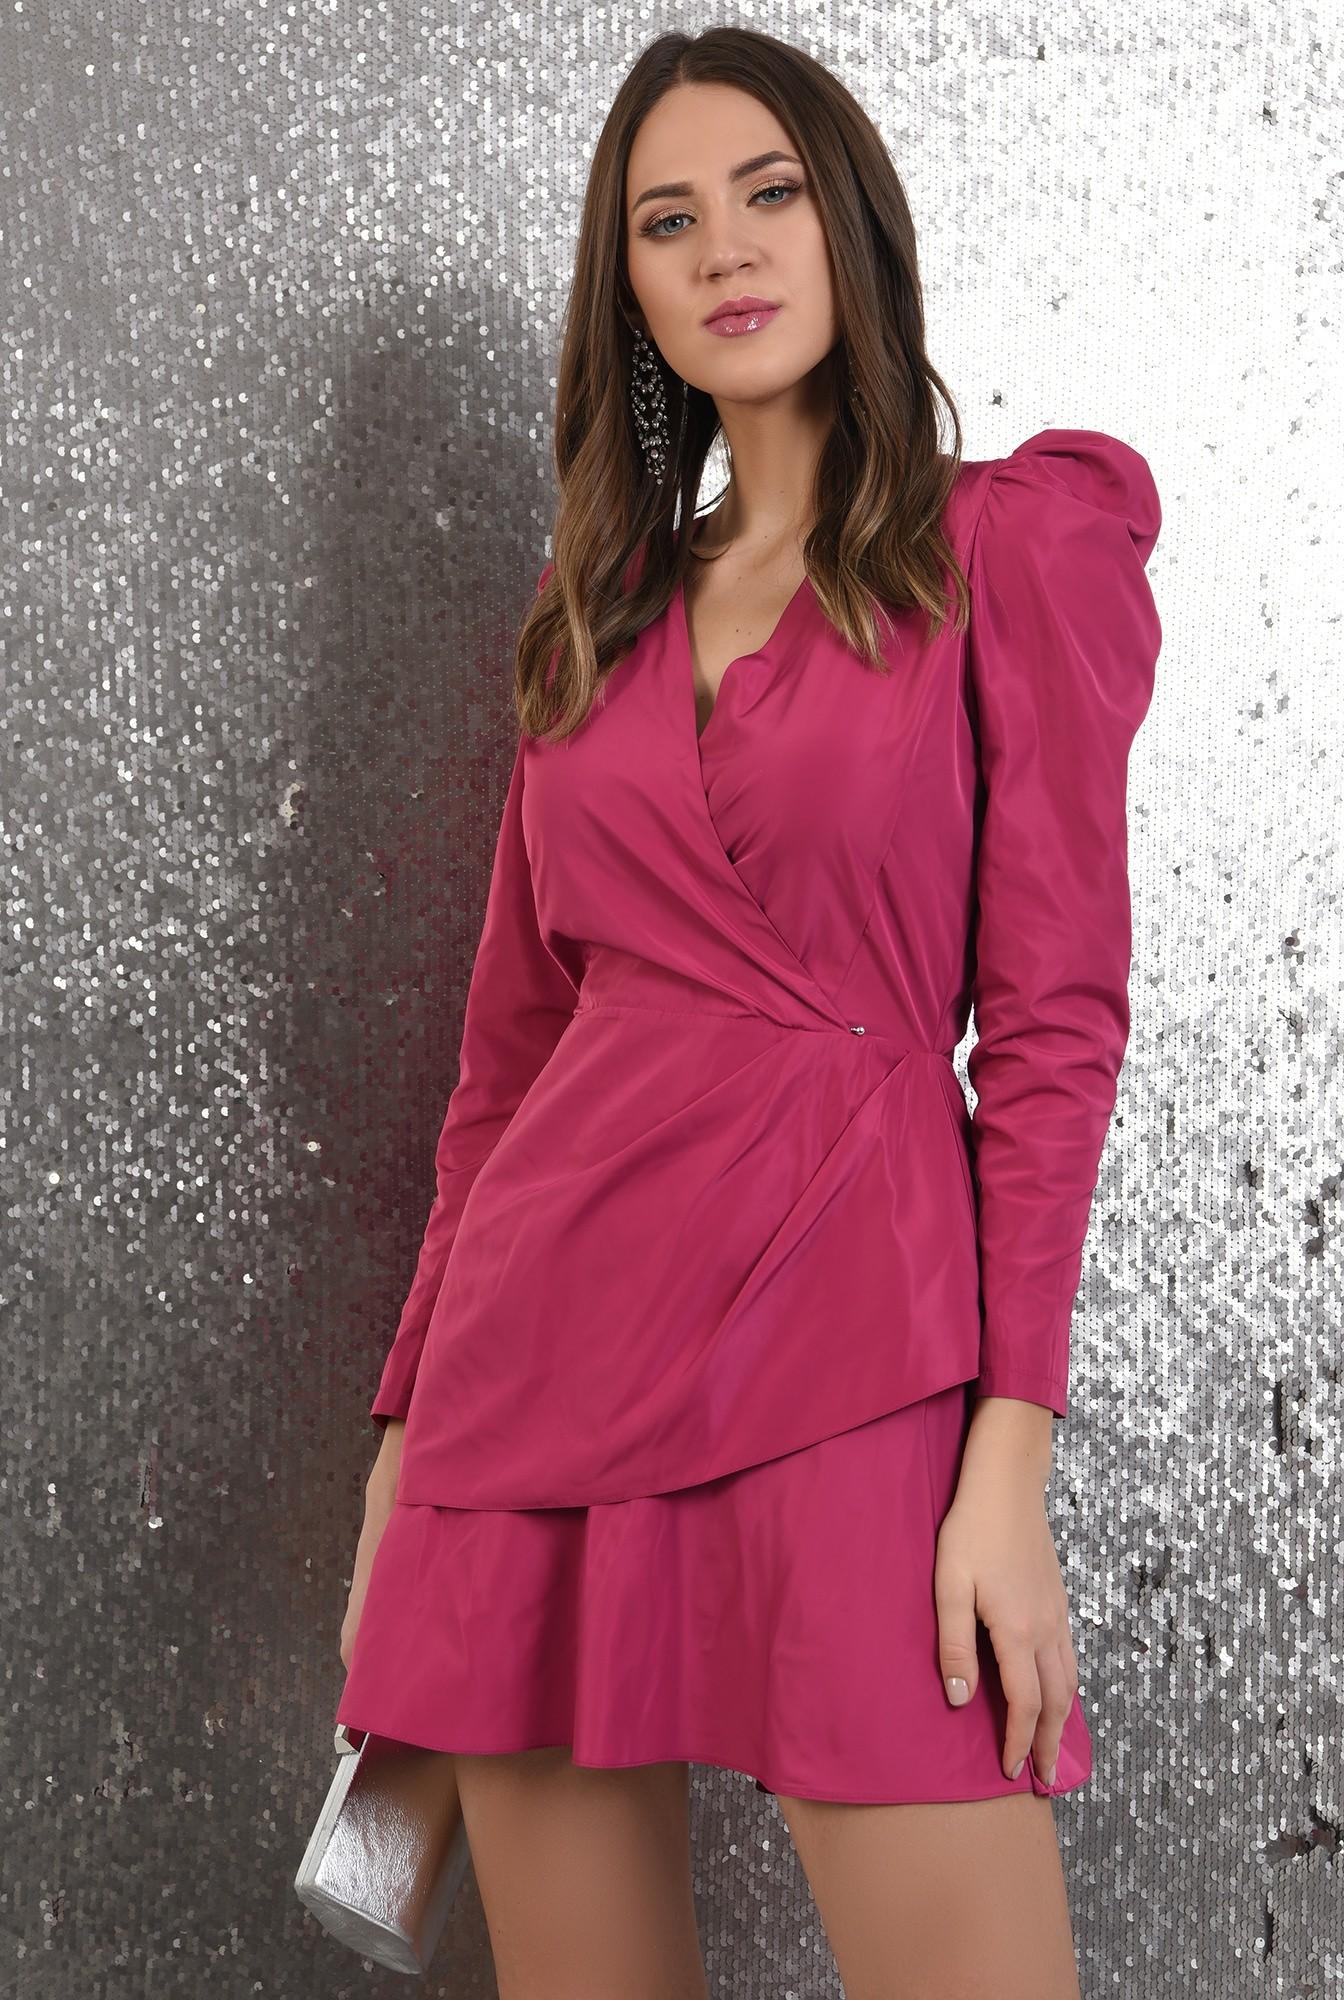 2 - rochie eleganta, petrecuta, cu pliuri decorative, maneci lungi, Poema